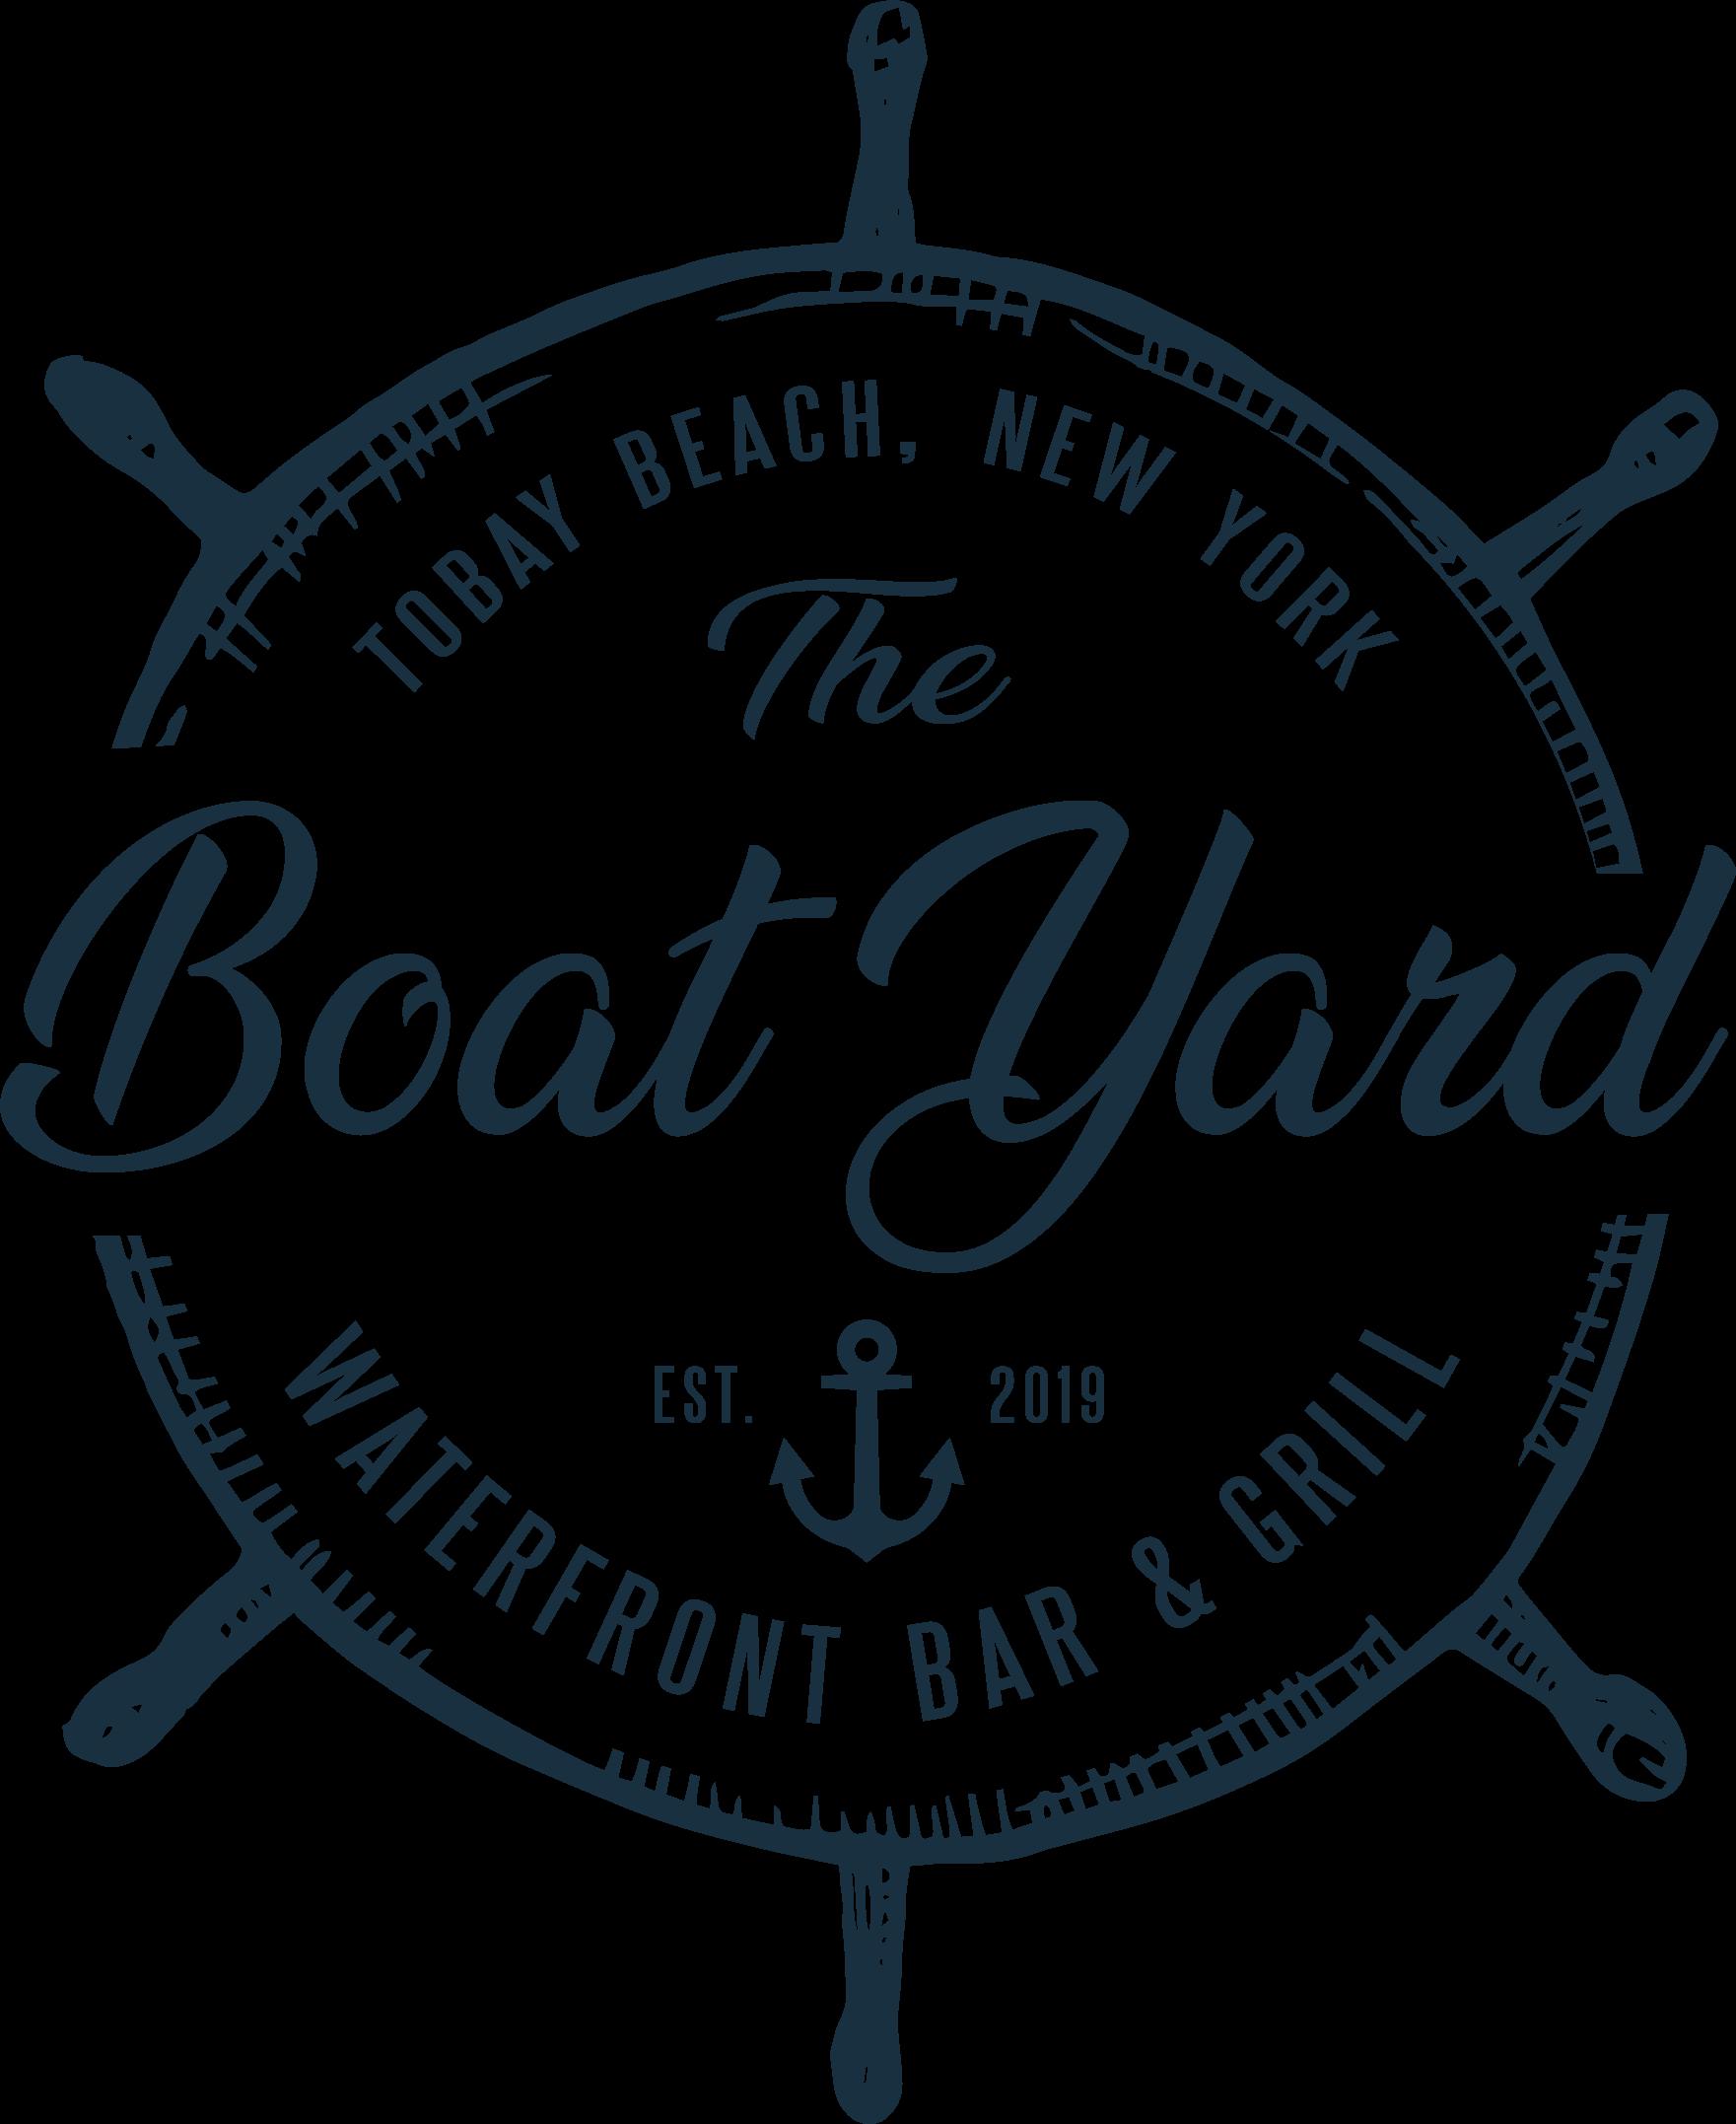 Boat Yard Logo